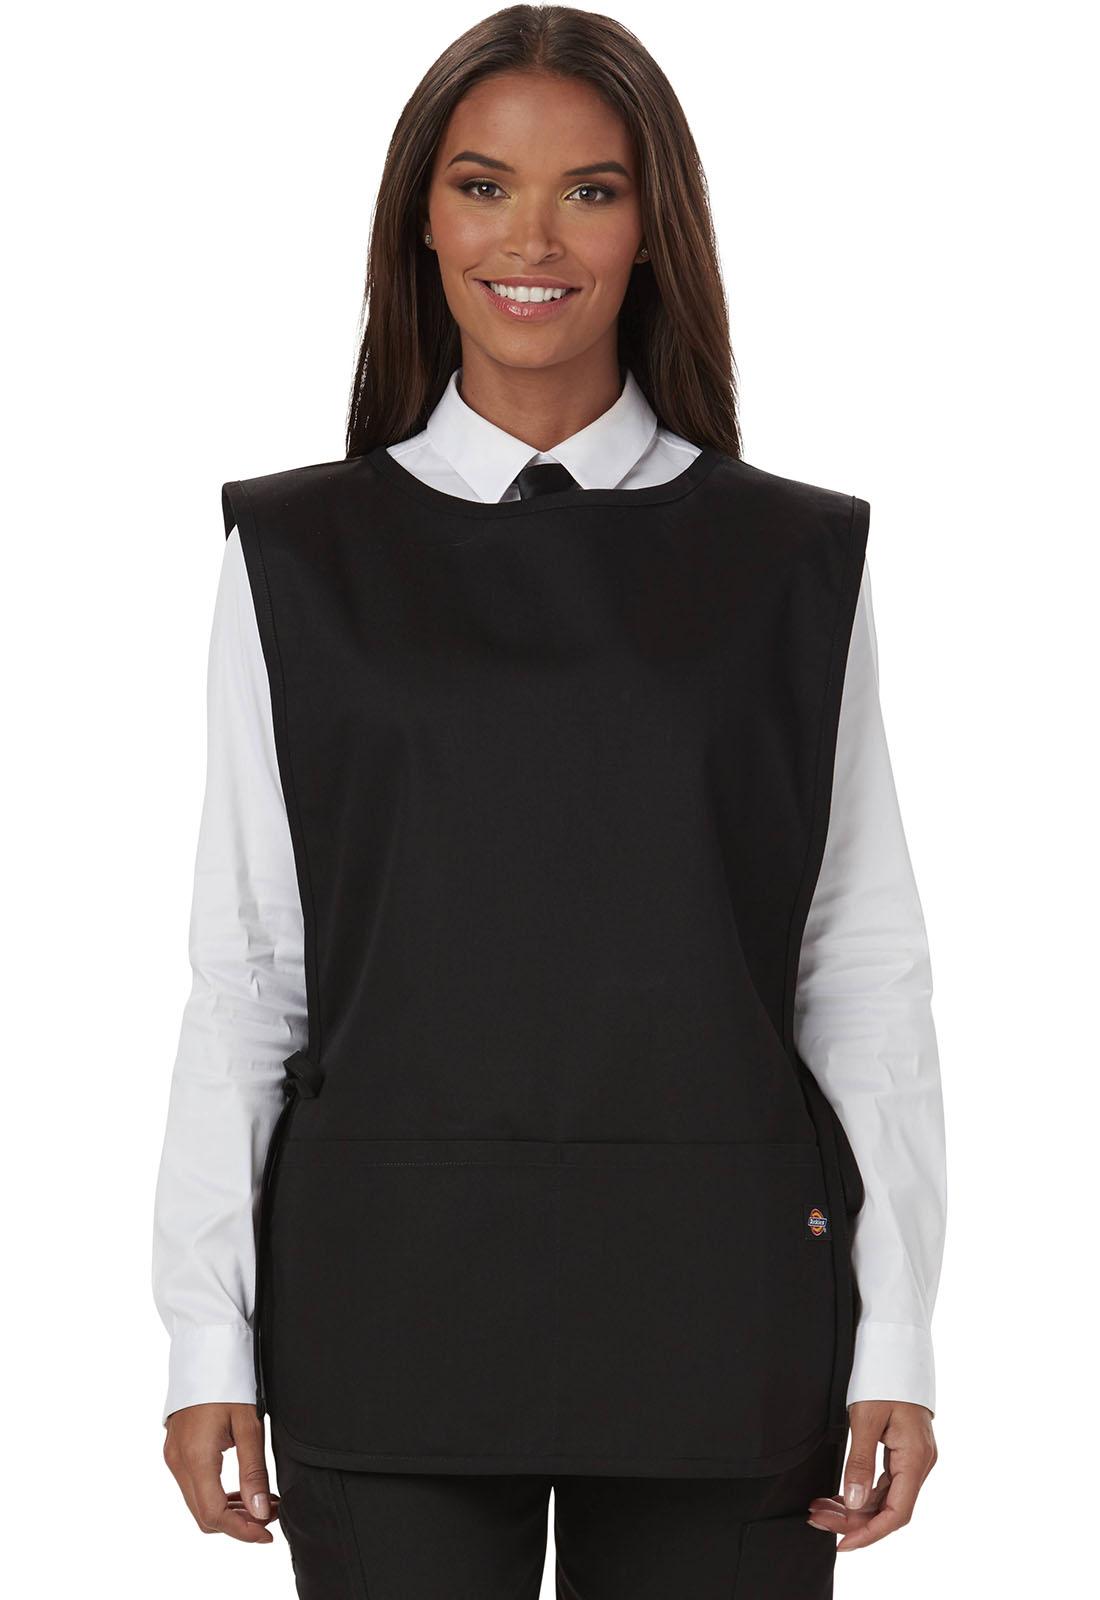 White apron doctors - Dickies Chef Unisex Cobble Bib Apron With Tie Sides Black